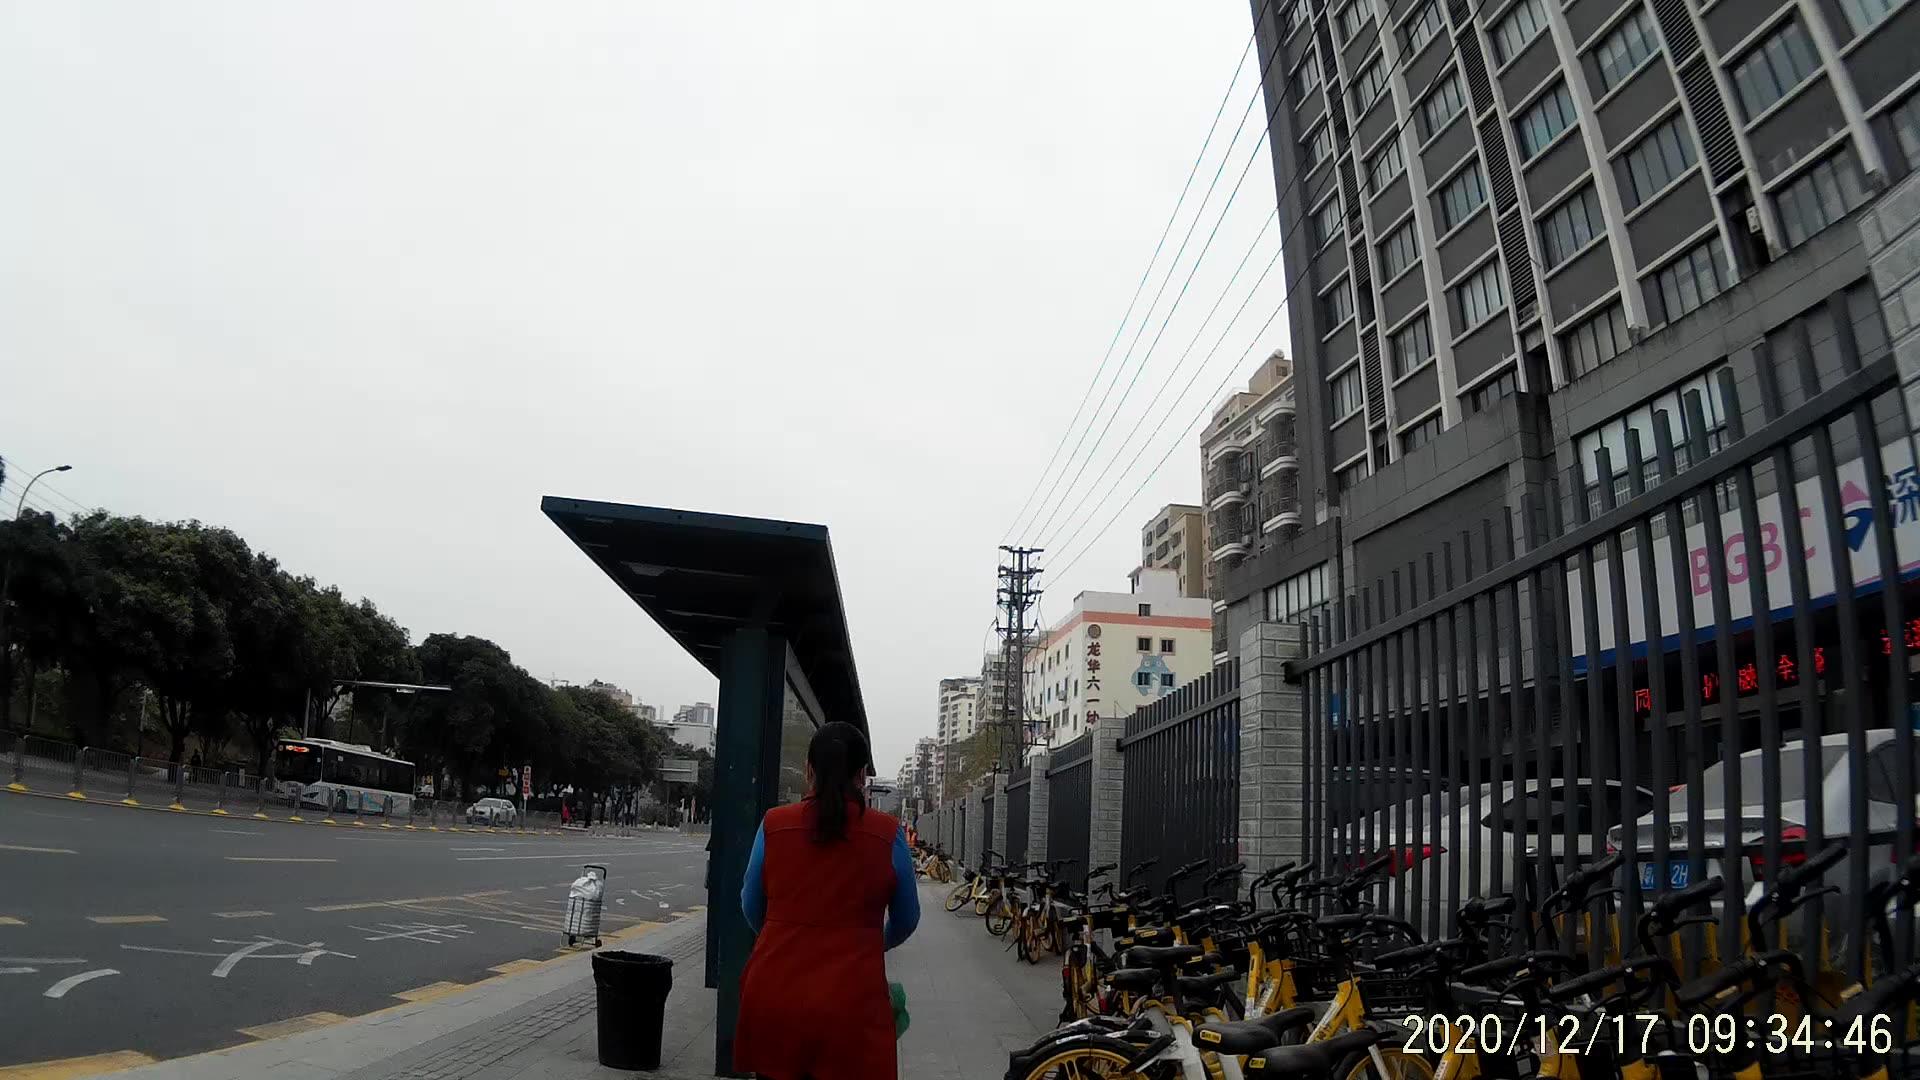 Wifi 1080p 30fpsフルhd防水ミニビデオレコーダーアクションカーdvrヘルメットスポーツカメラ